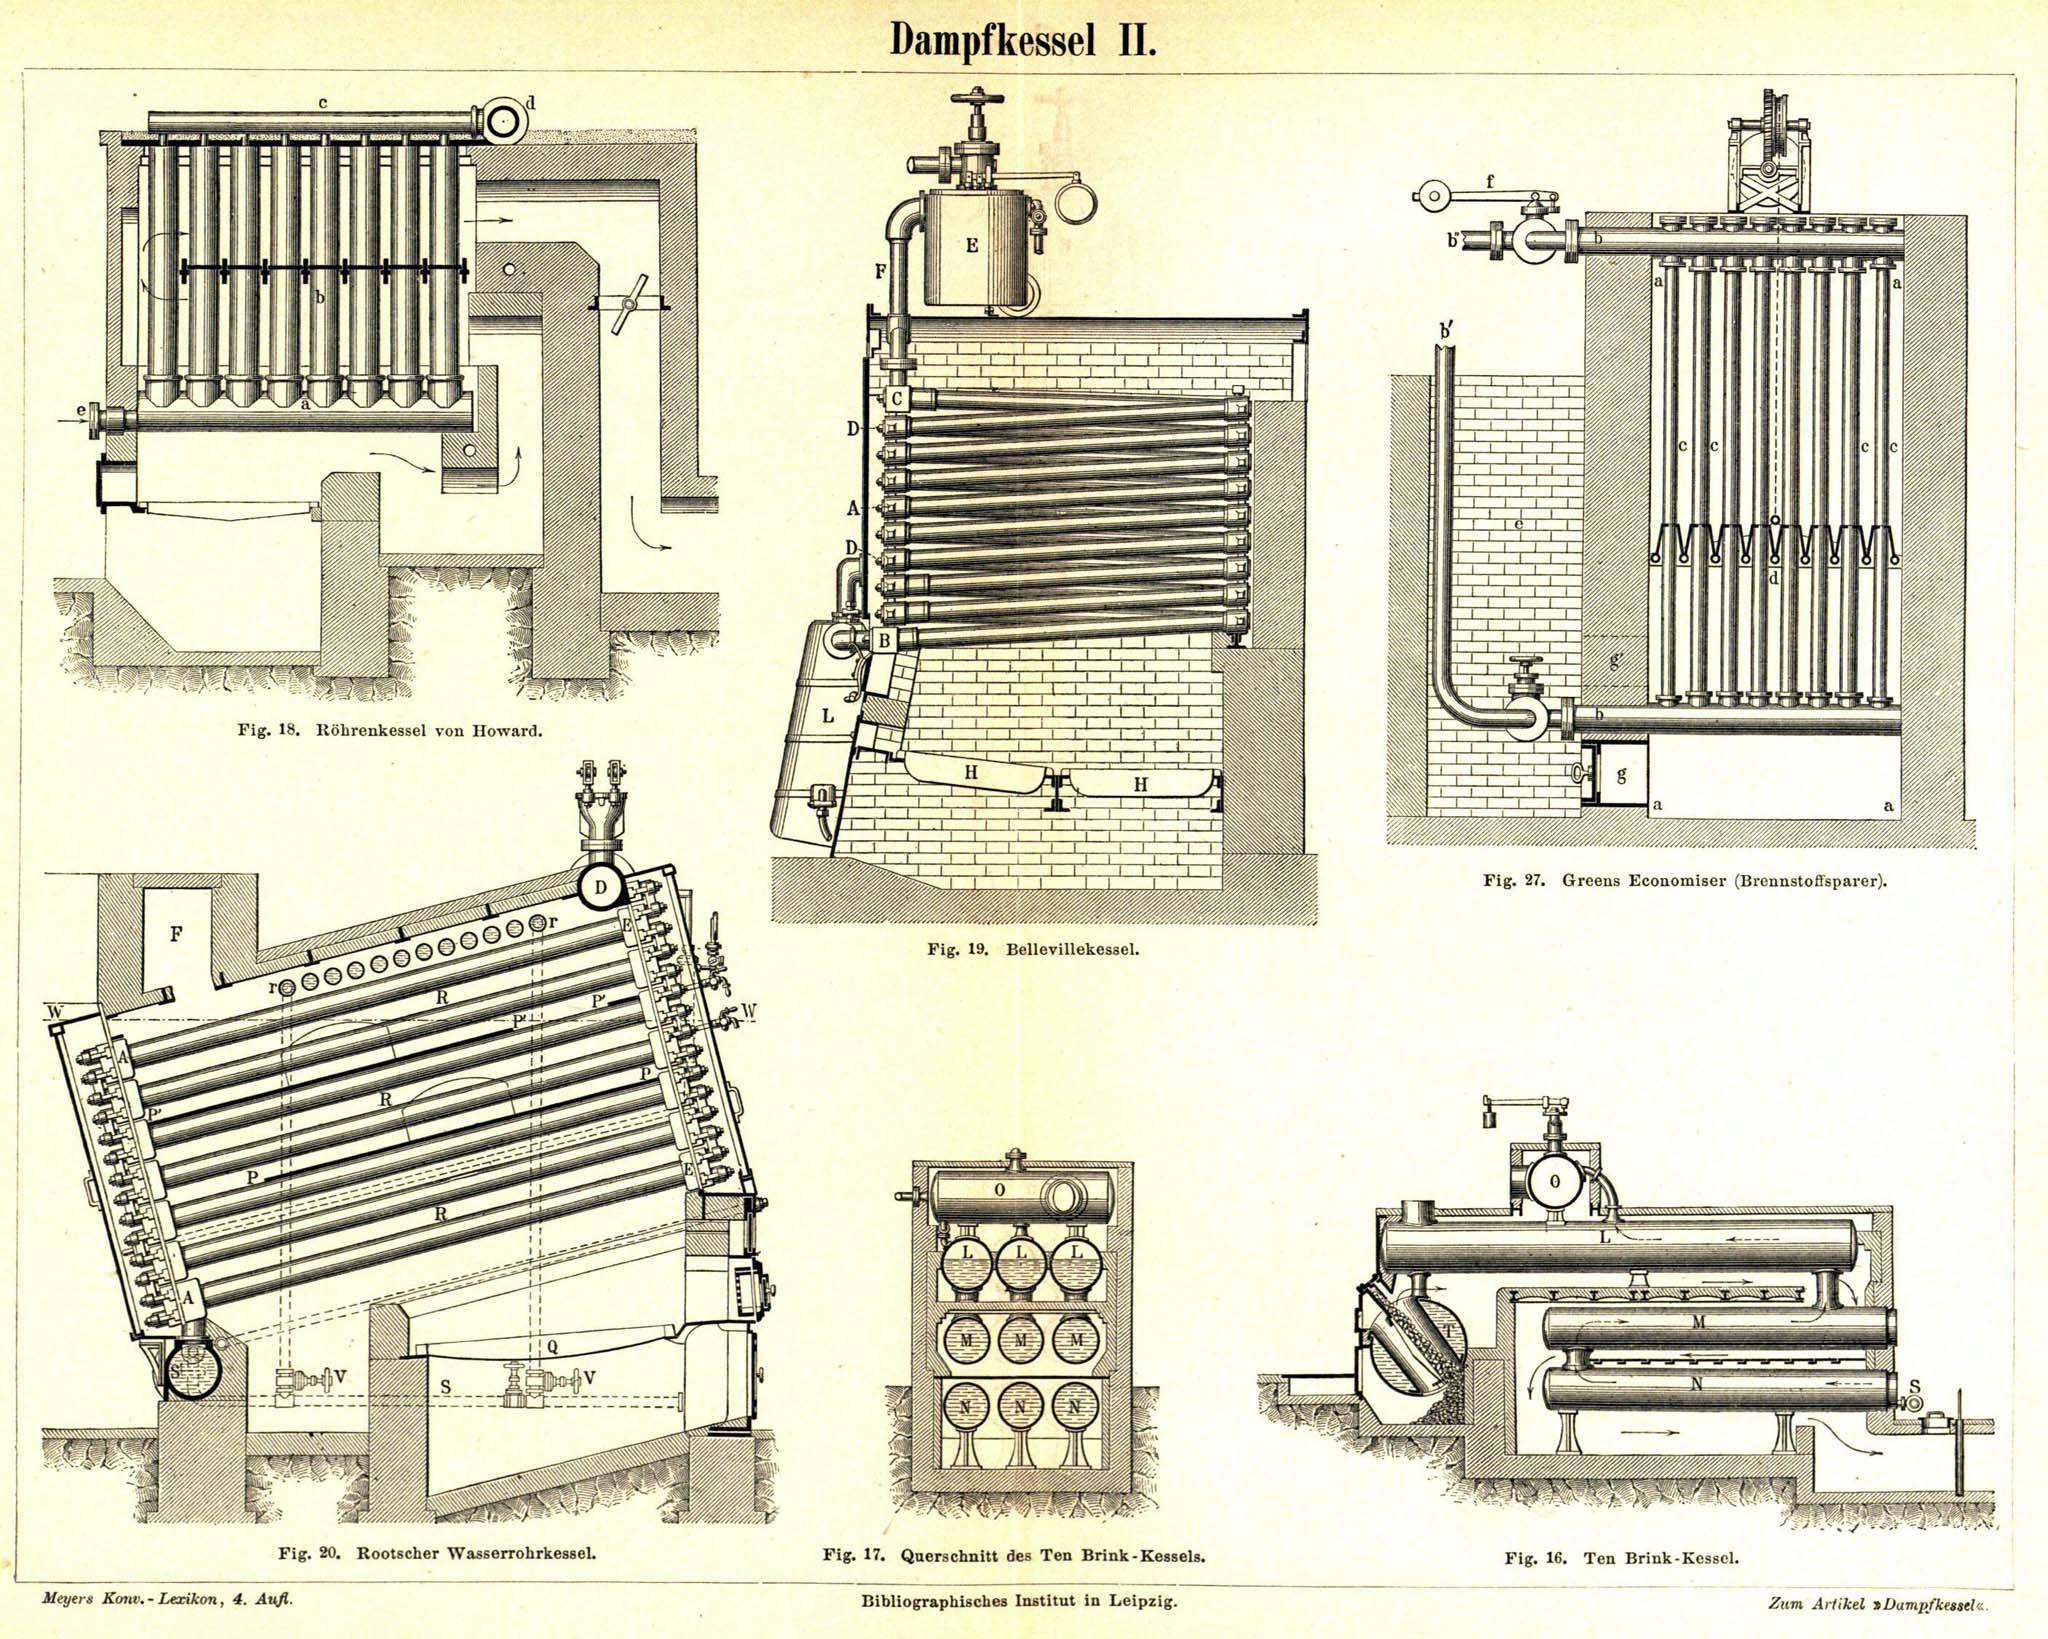 Erfreut Dampfkessel Wikipedia Fotos - Schaltplan Serie Circuit ...